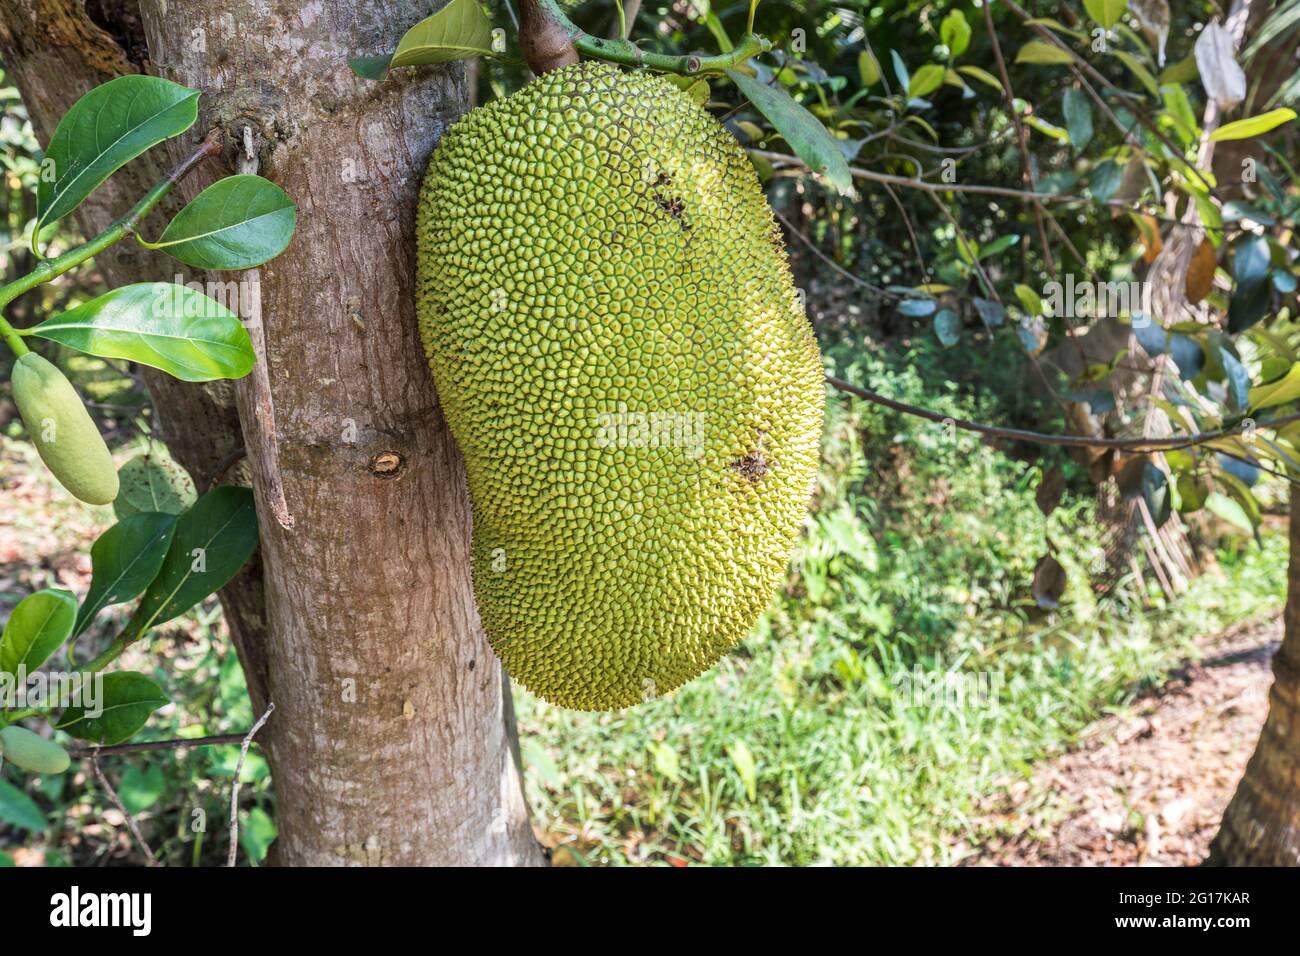 Jackfruit, Artocarpus heterophyllus, famille Moraceae, Wat Bang Kung, Thaïlande Banque D'Images